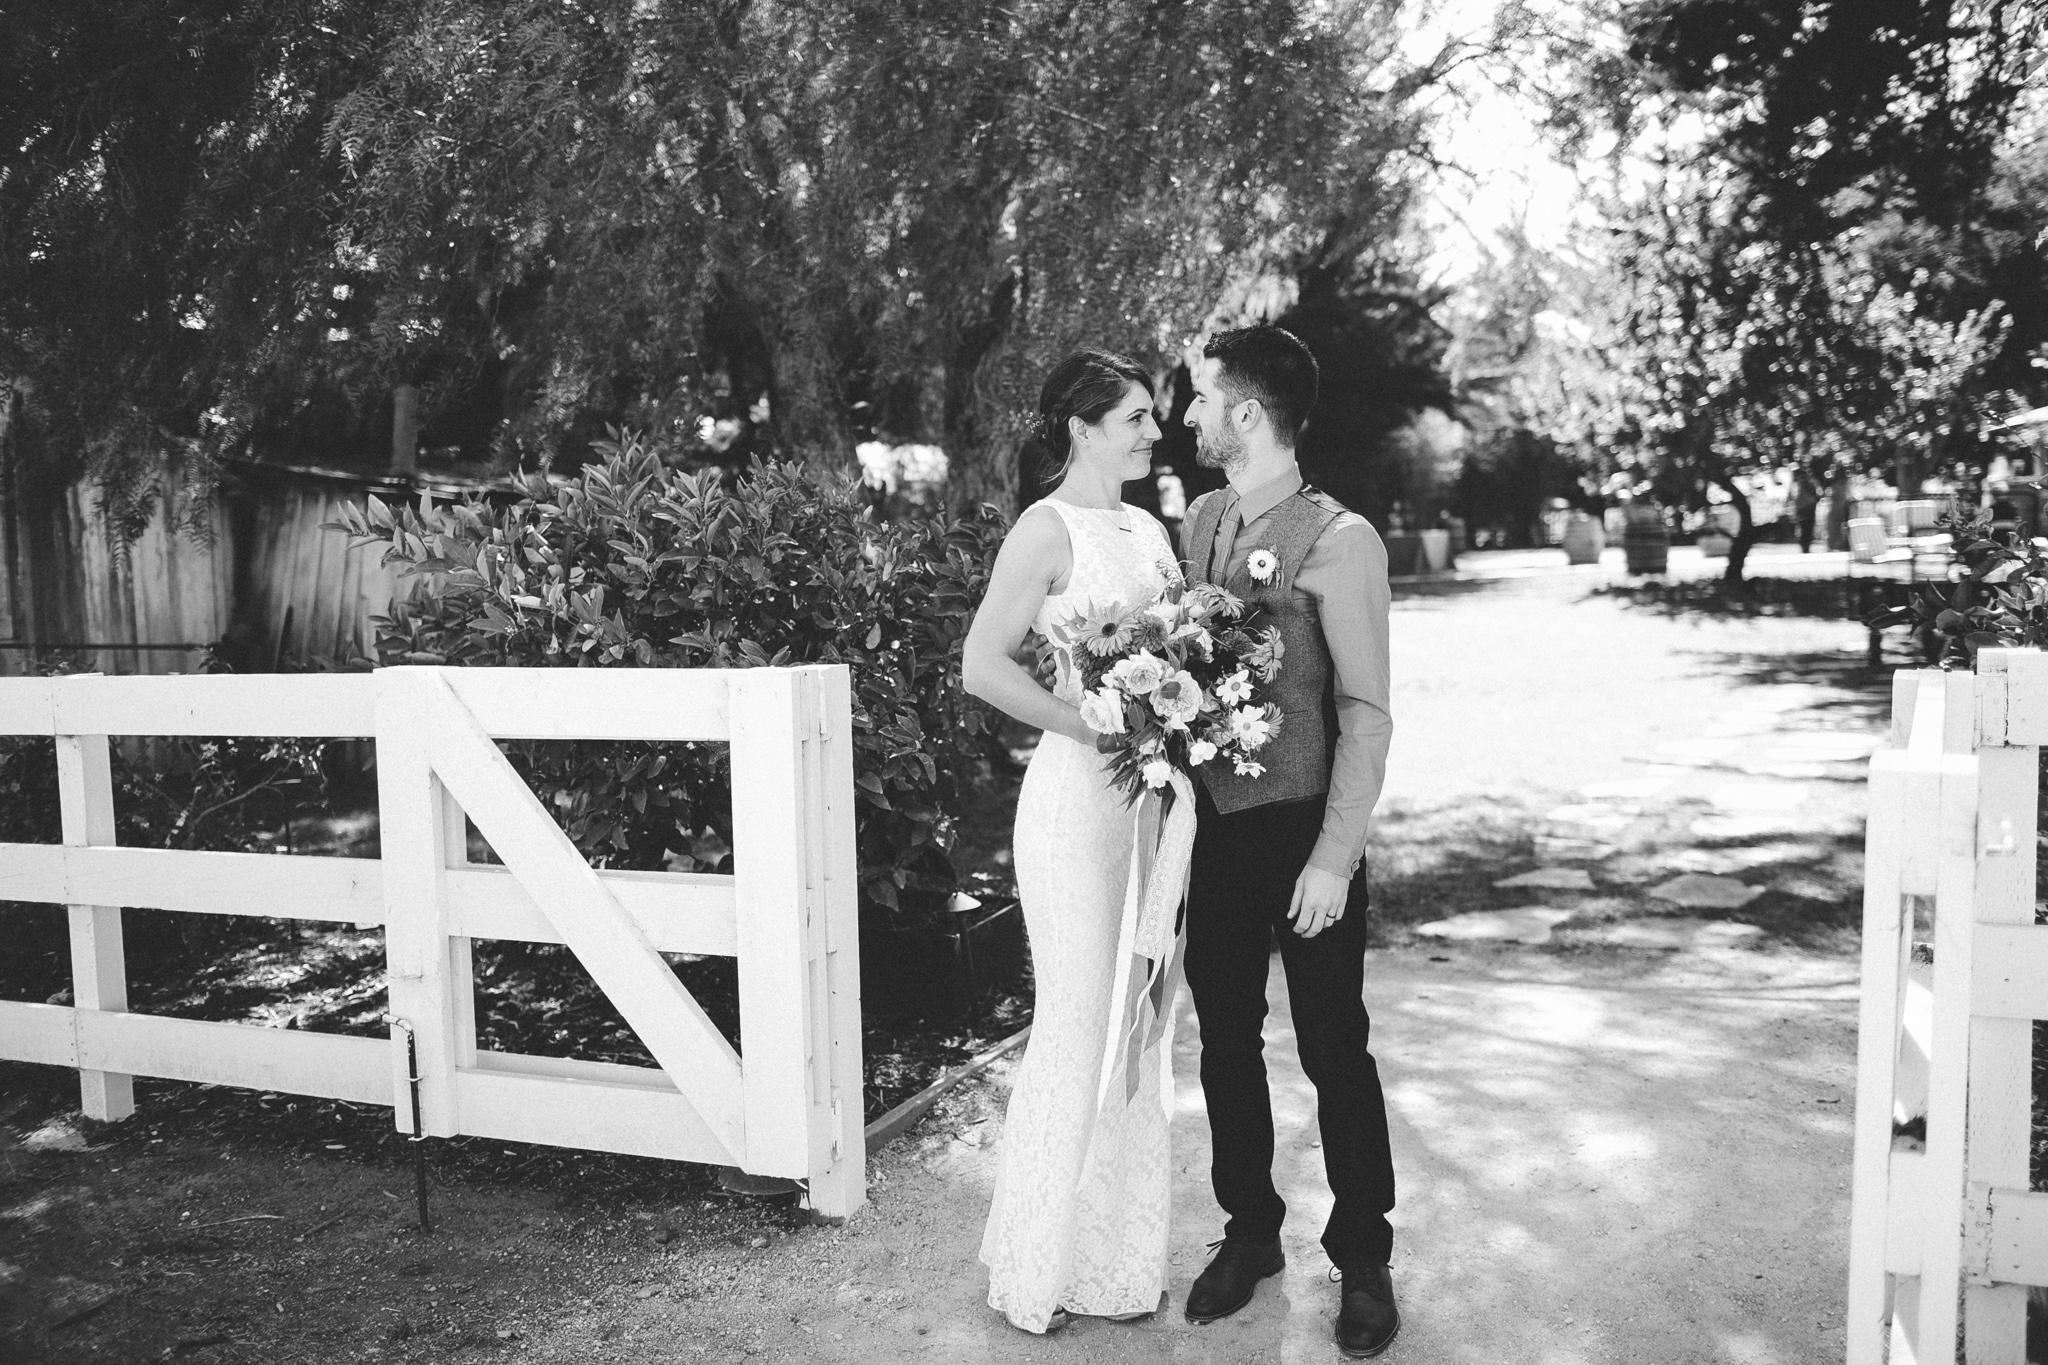 Kelly+Drew-WEDDING_KellyBoitano20160211_0060